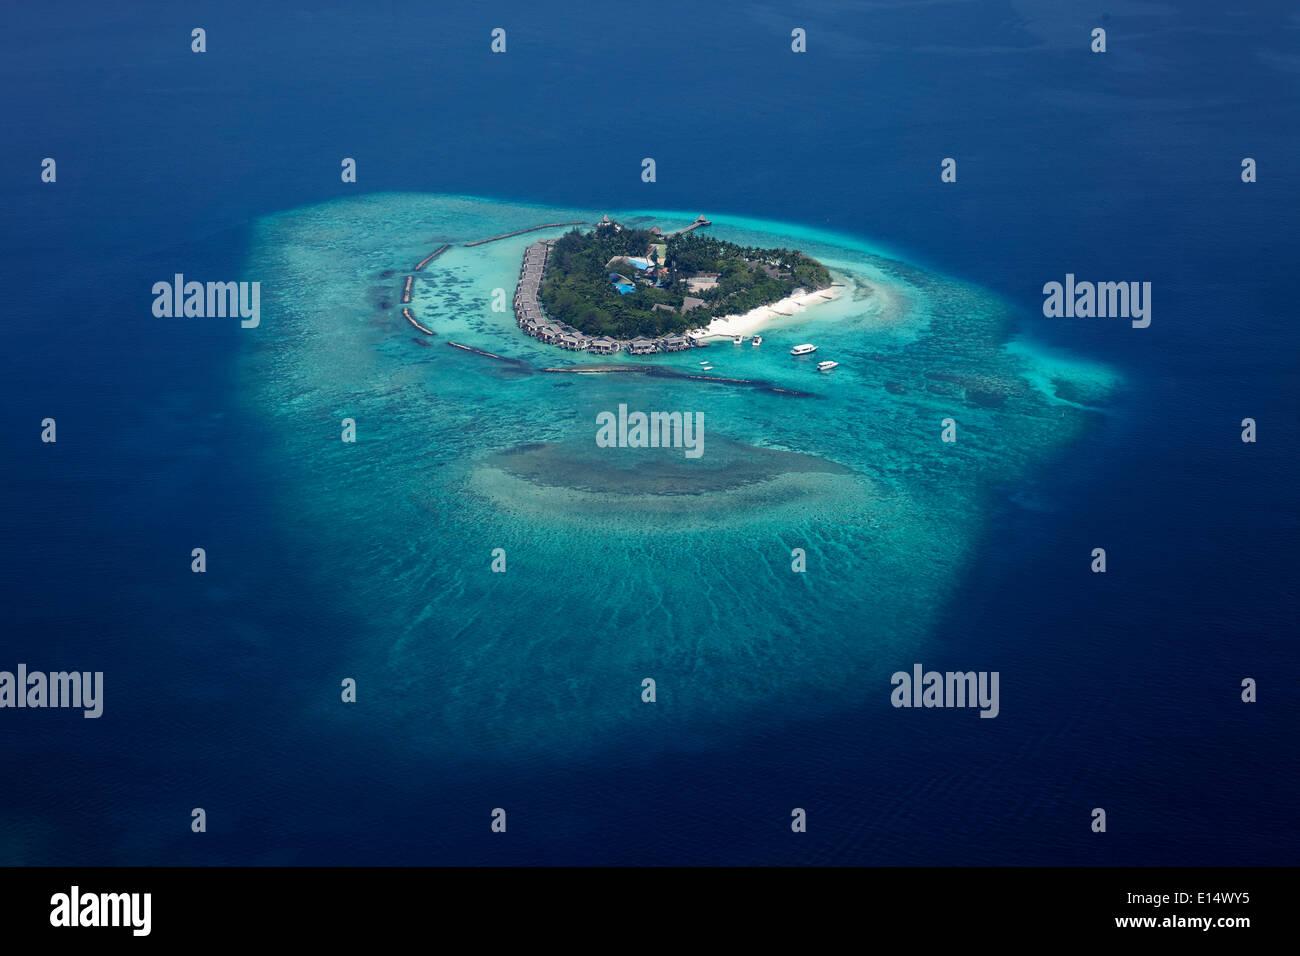 Luftaufnahme, Insel im Indischen Ozean, Malediven Stockbild